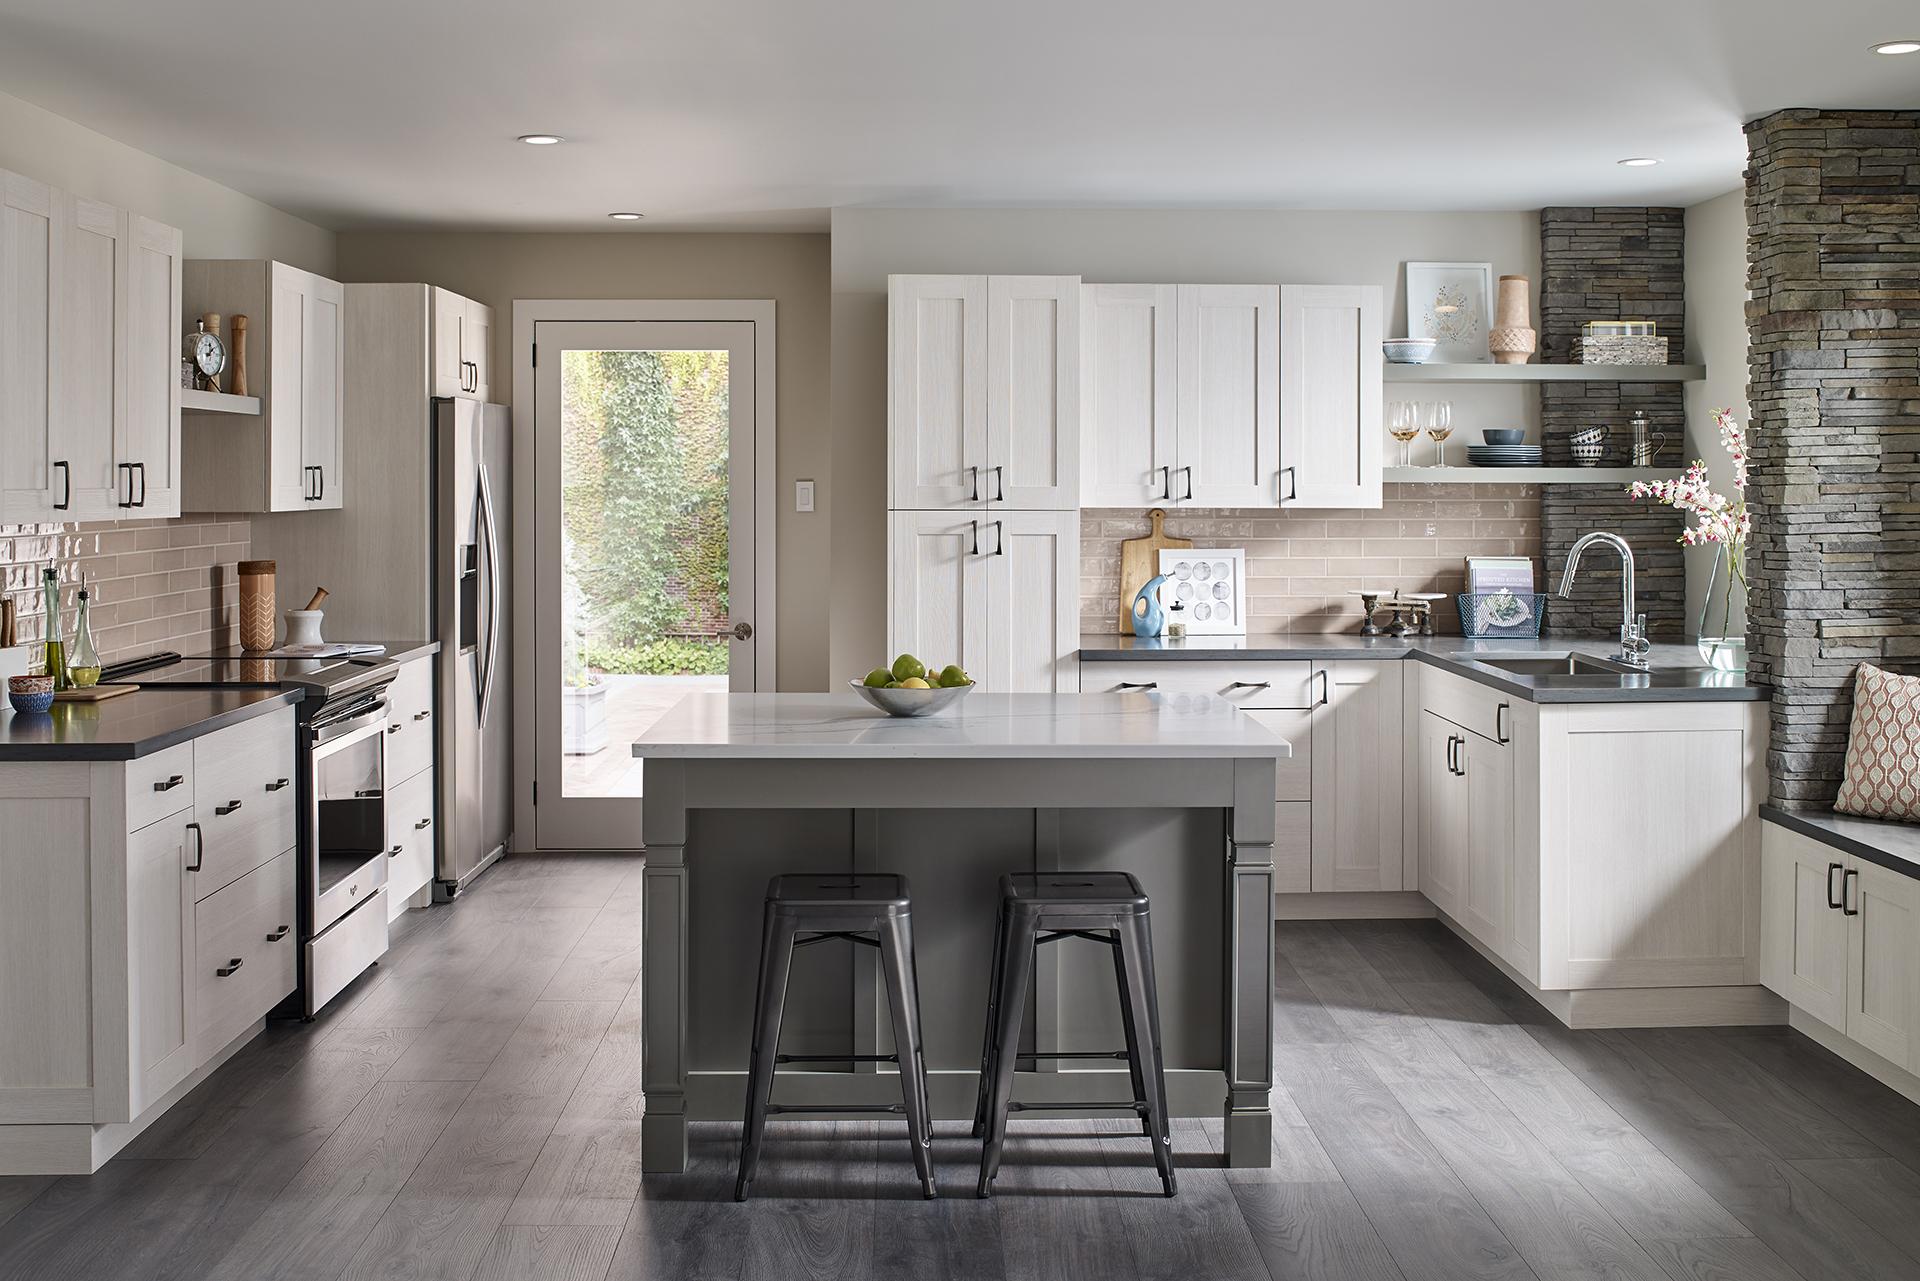 Europa Kitchen Design - Remodel Republic